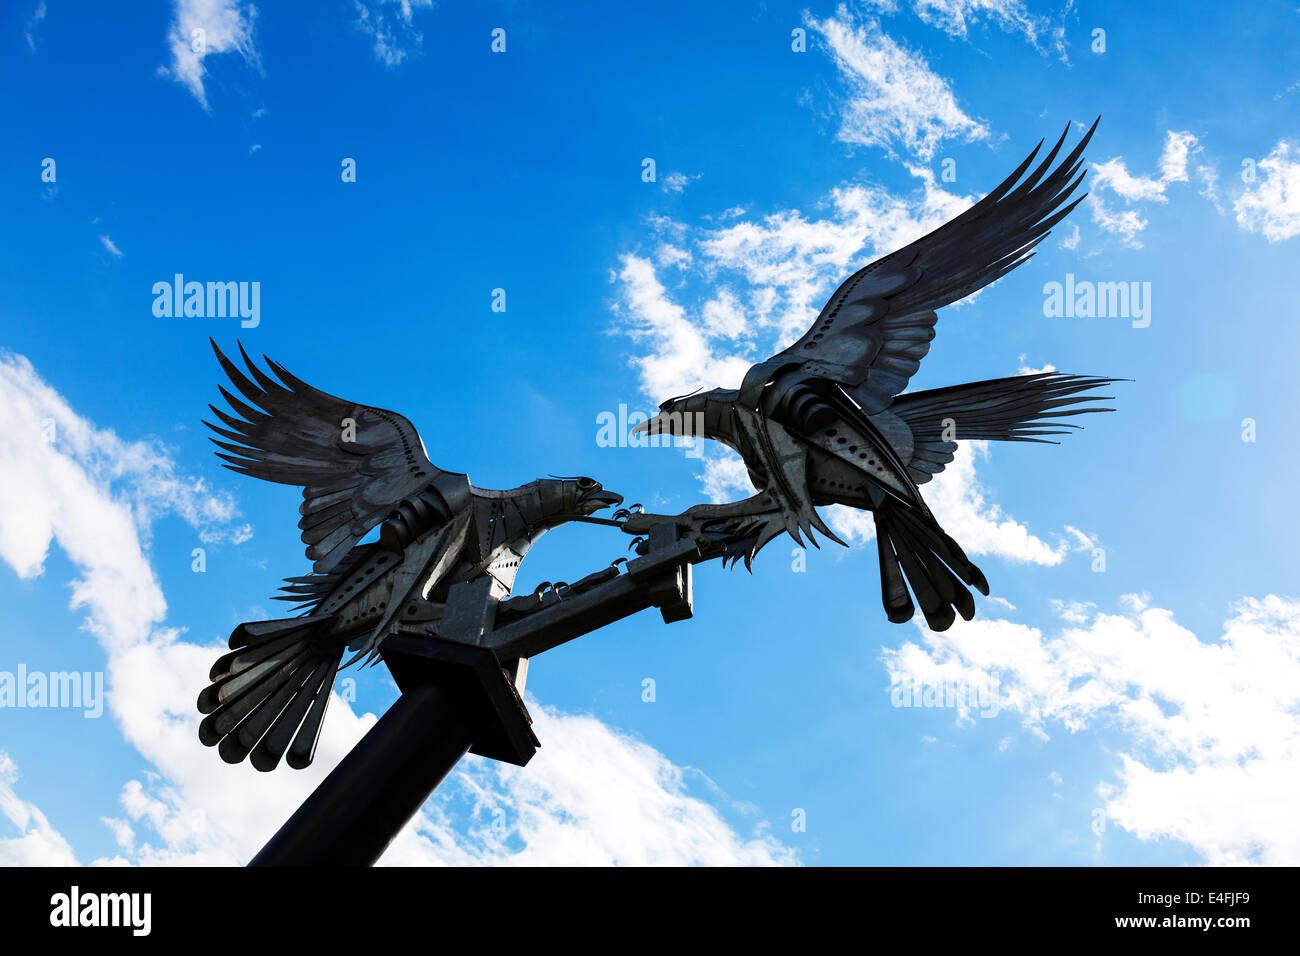 Malvern auras aves escultura metálica en Great Malvern por Walenty Pytel Imagen De Stock